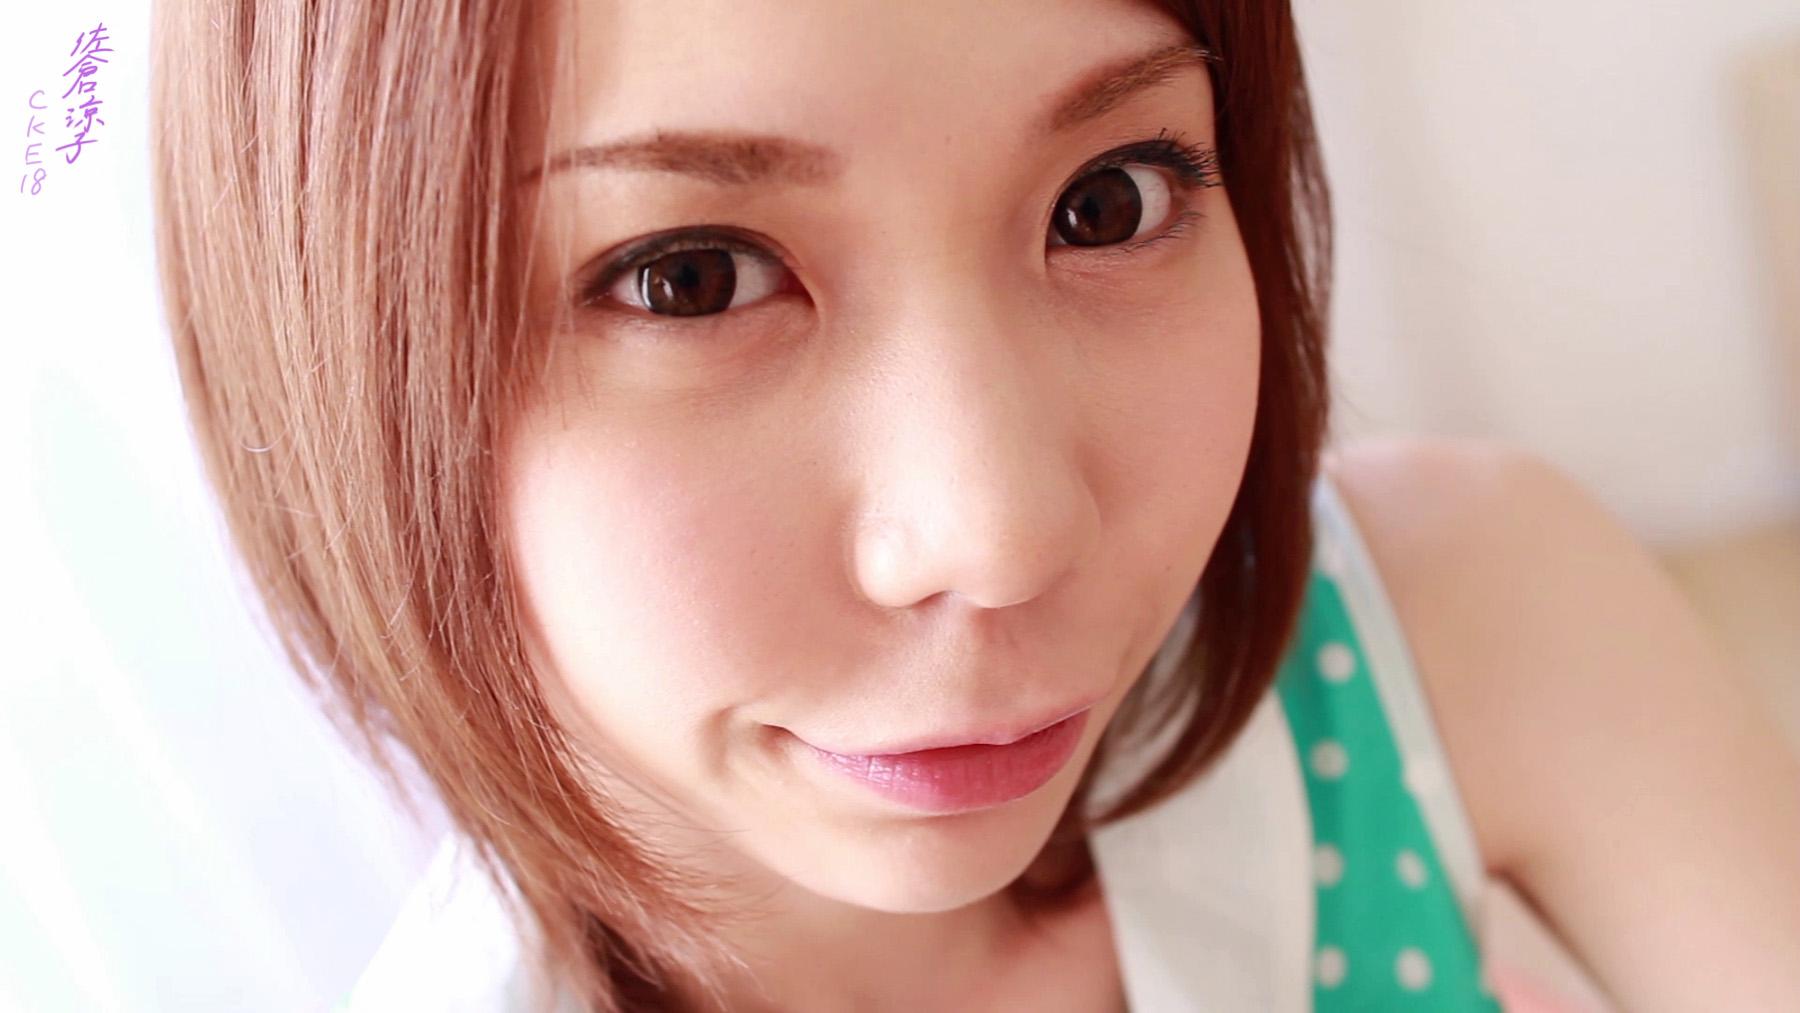 Japanese girl fully nude 12